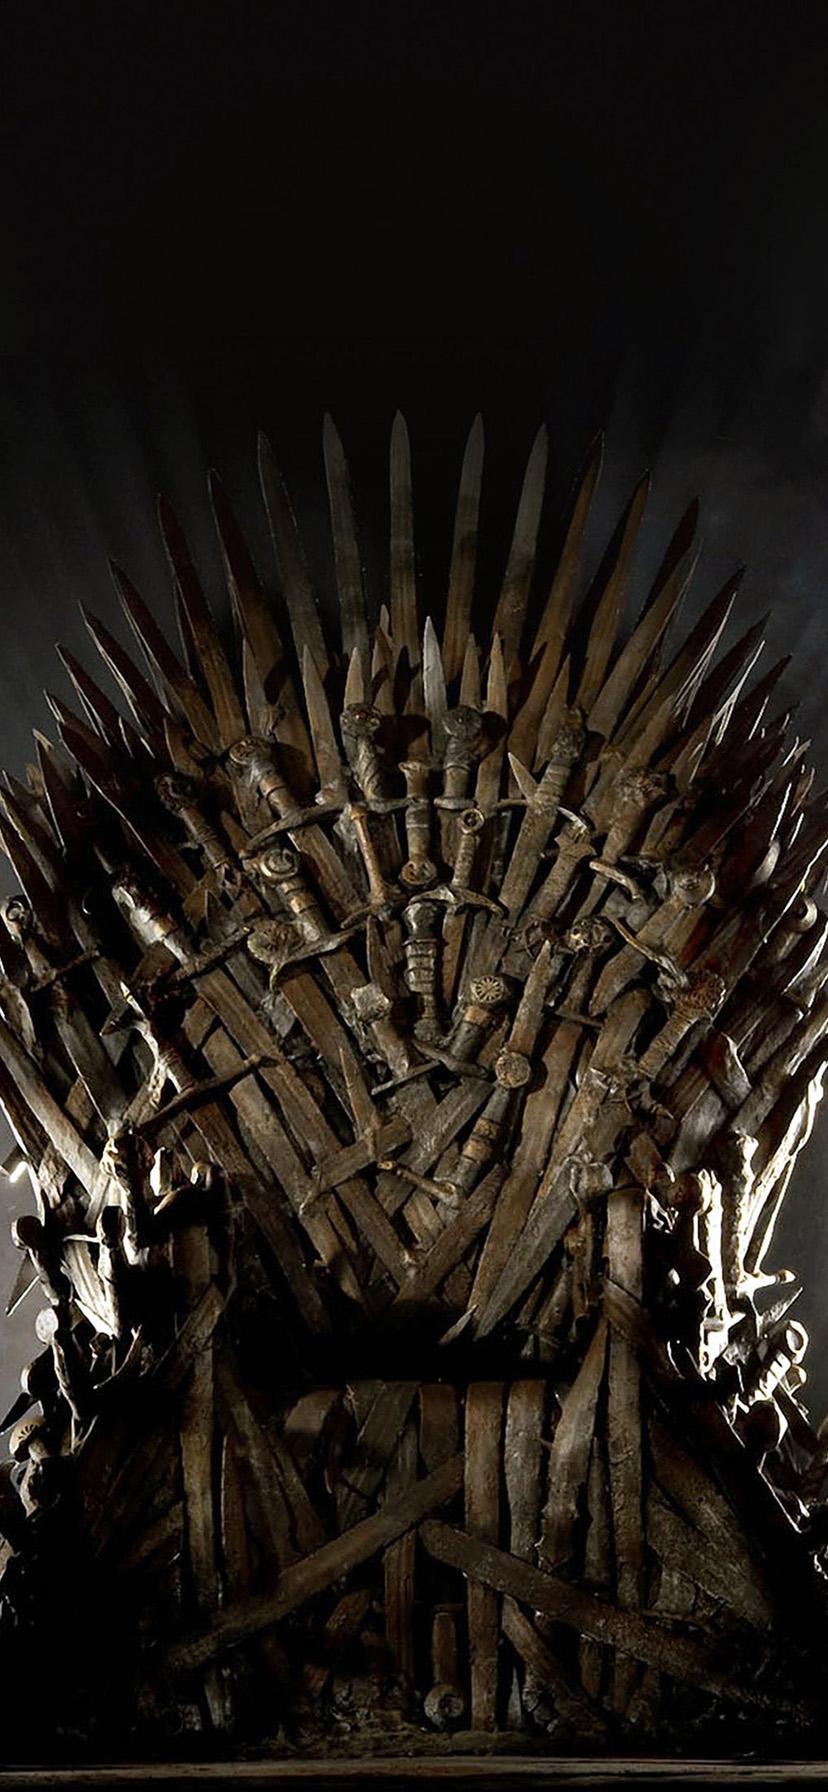 Download Iphone Xr Wallpaper Game Of Thrones Poster - Game Of Thrones Iphone Xr - HD Wallpaper